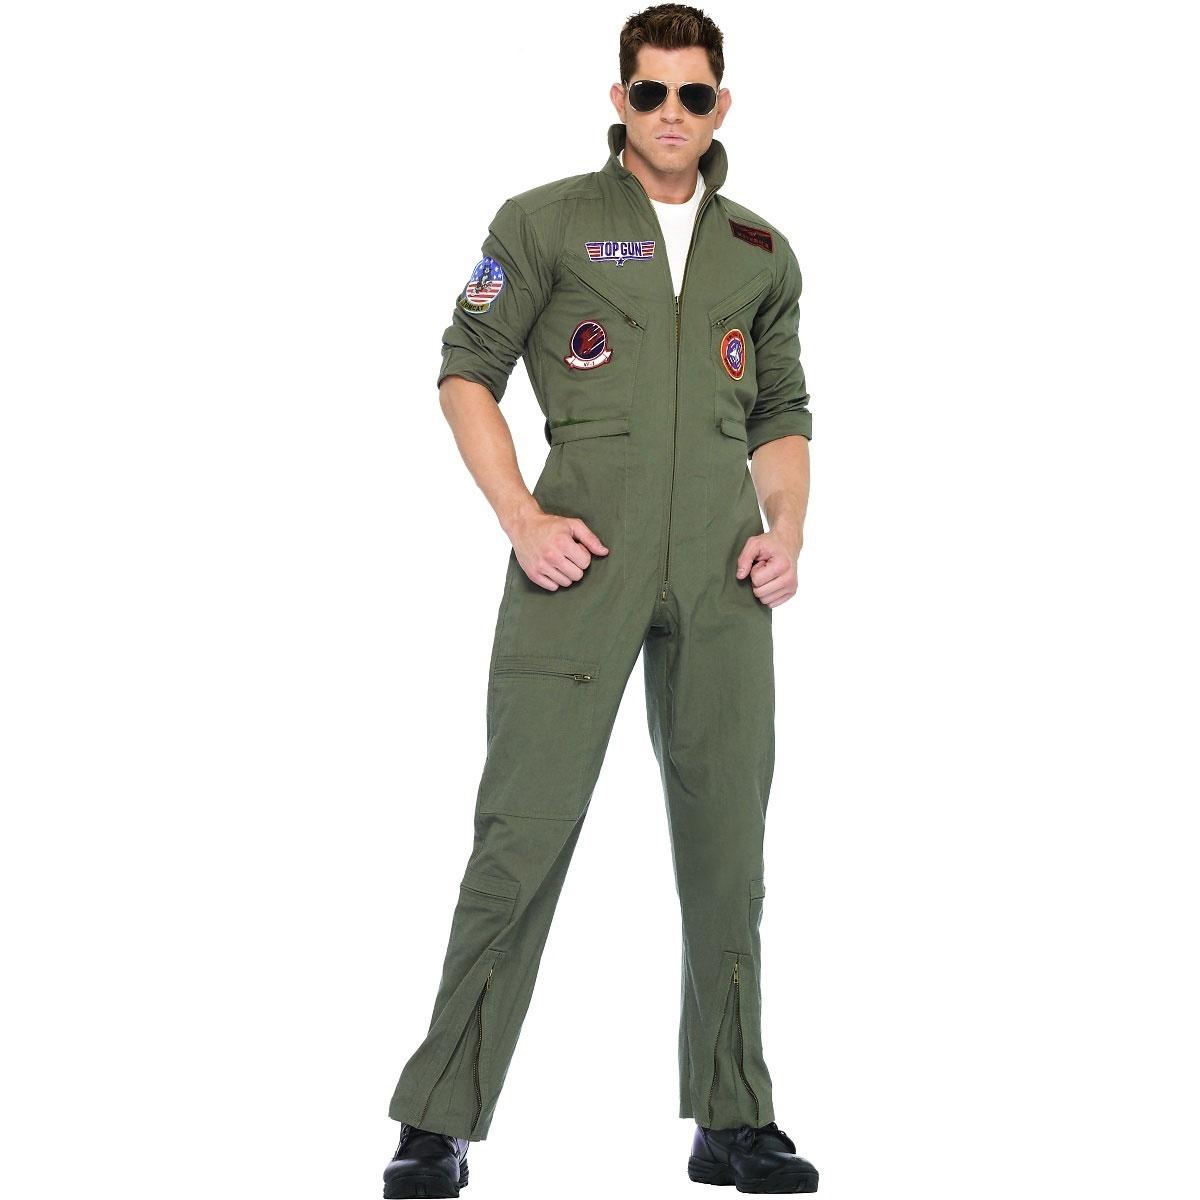 Image Result For Goose Top Gun Halloween